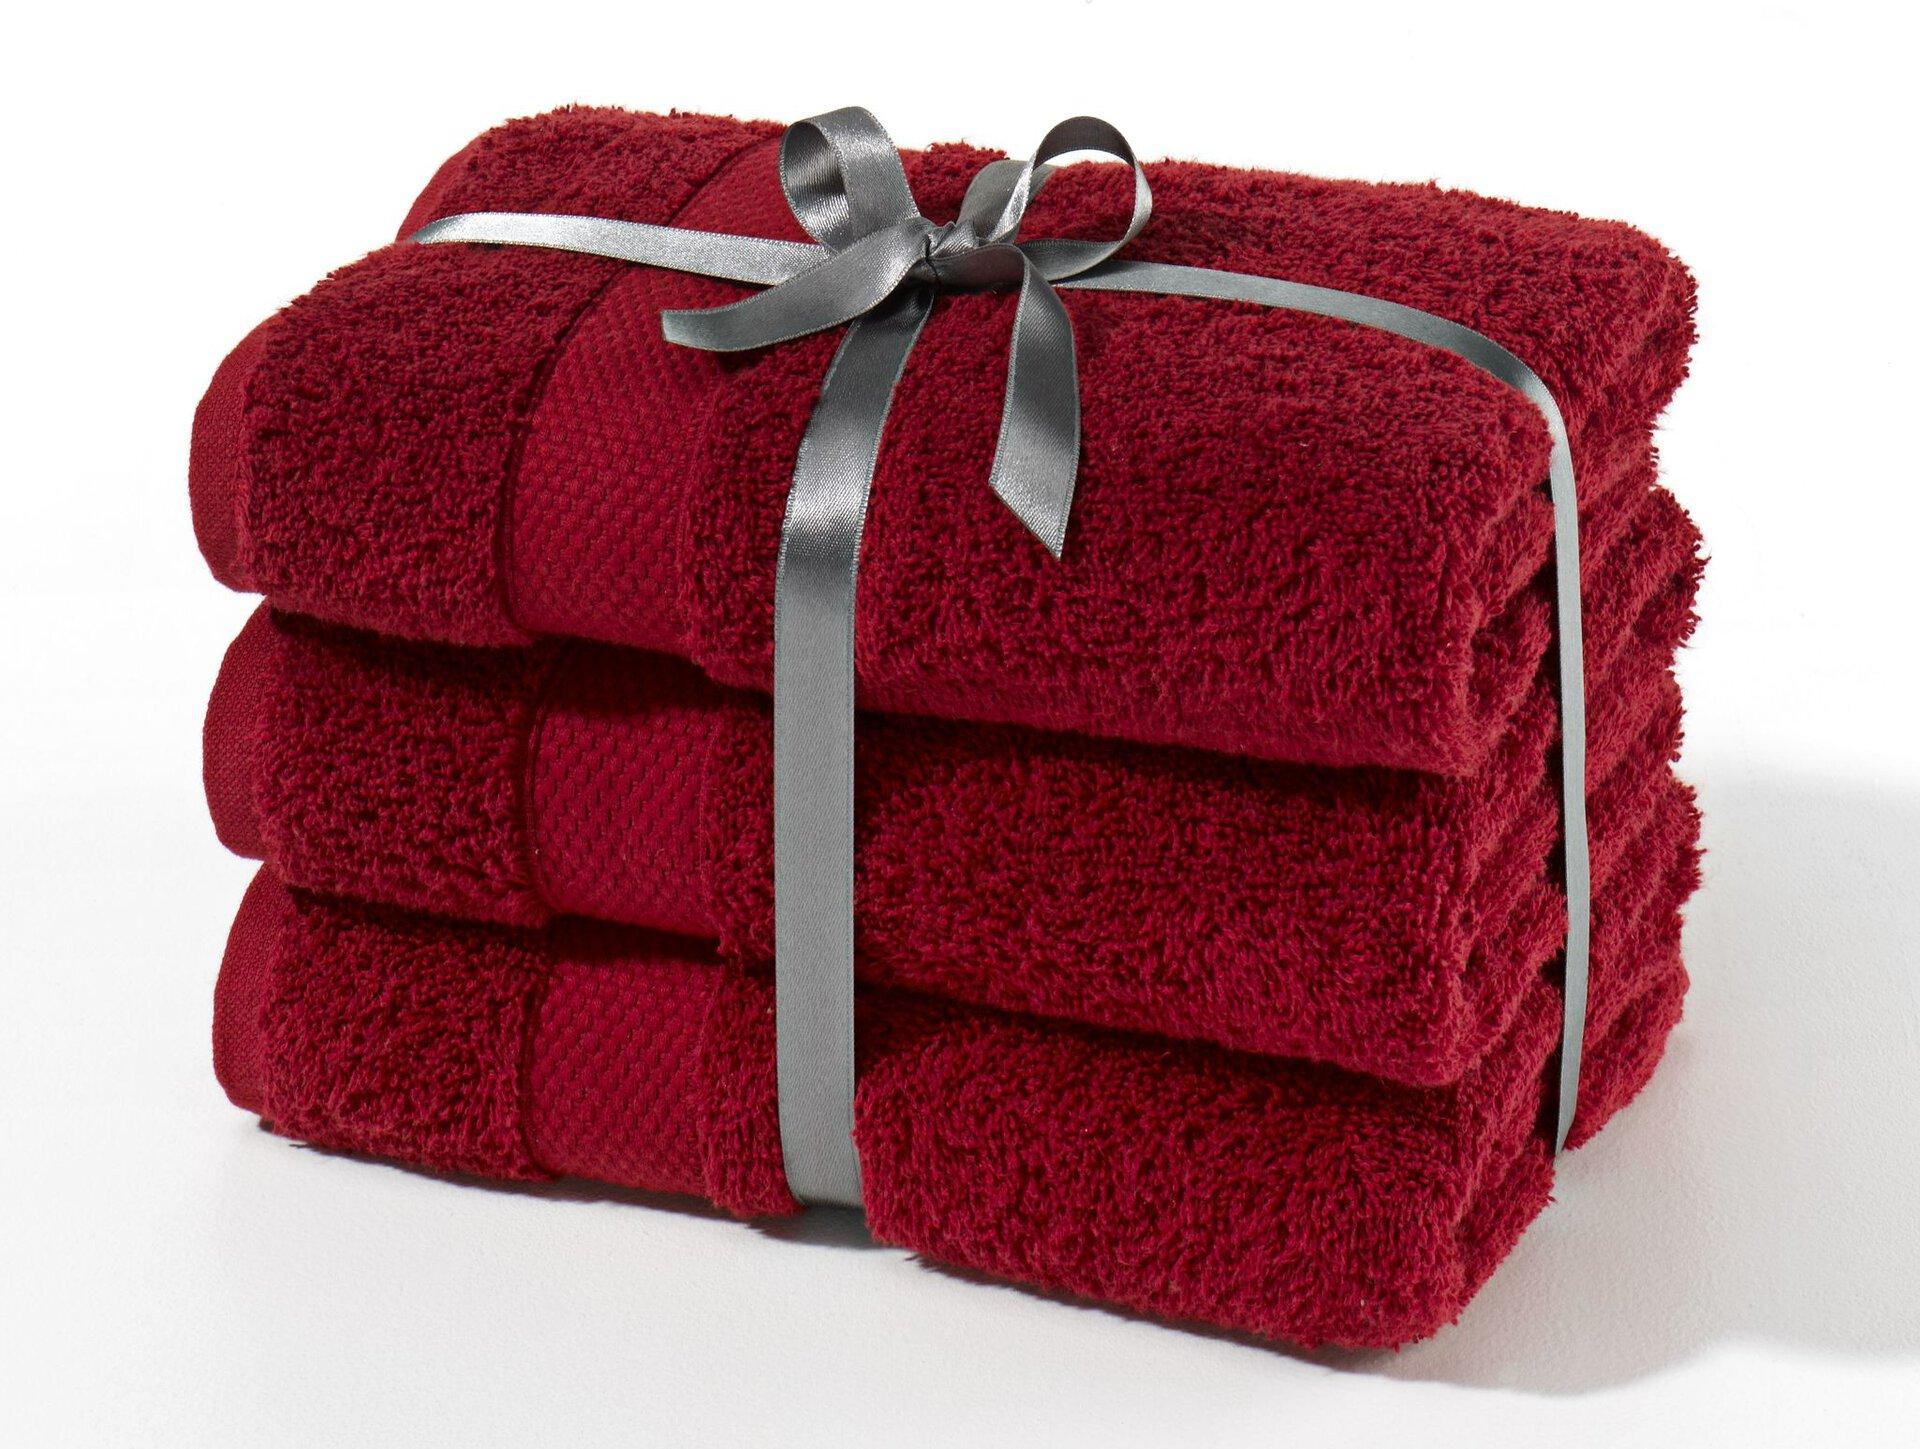 Handtuch Frottierset Casa Nova Textil rot 50 x 100 cm